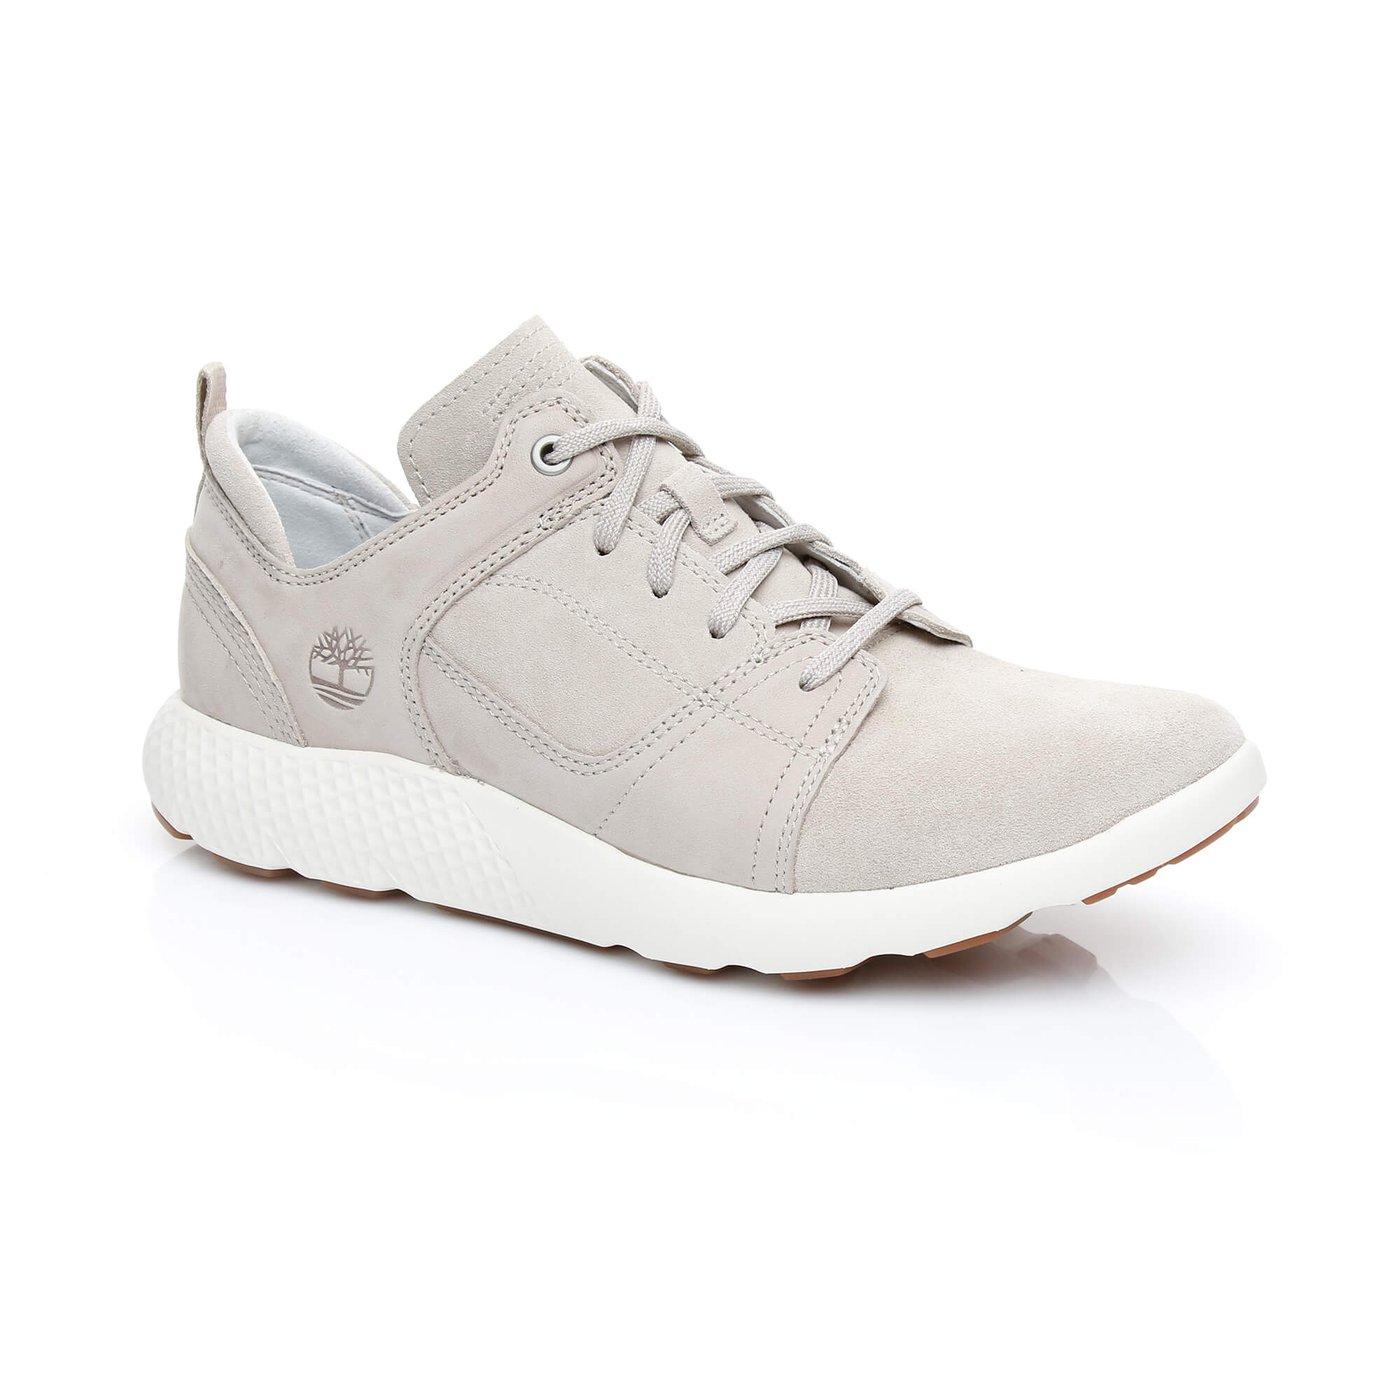 Tımberland Flyroam Erkek Bej Sneakers